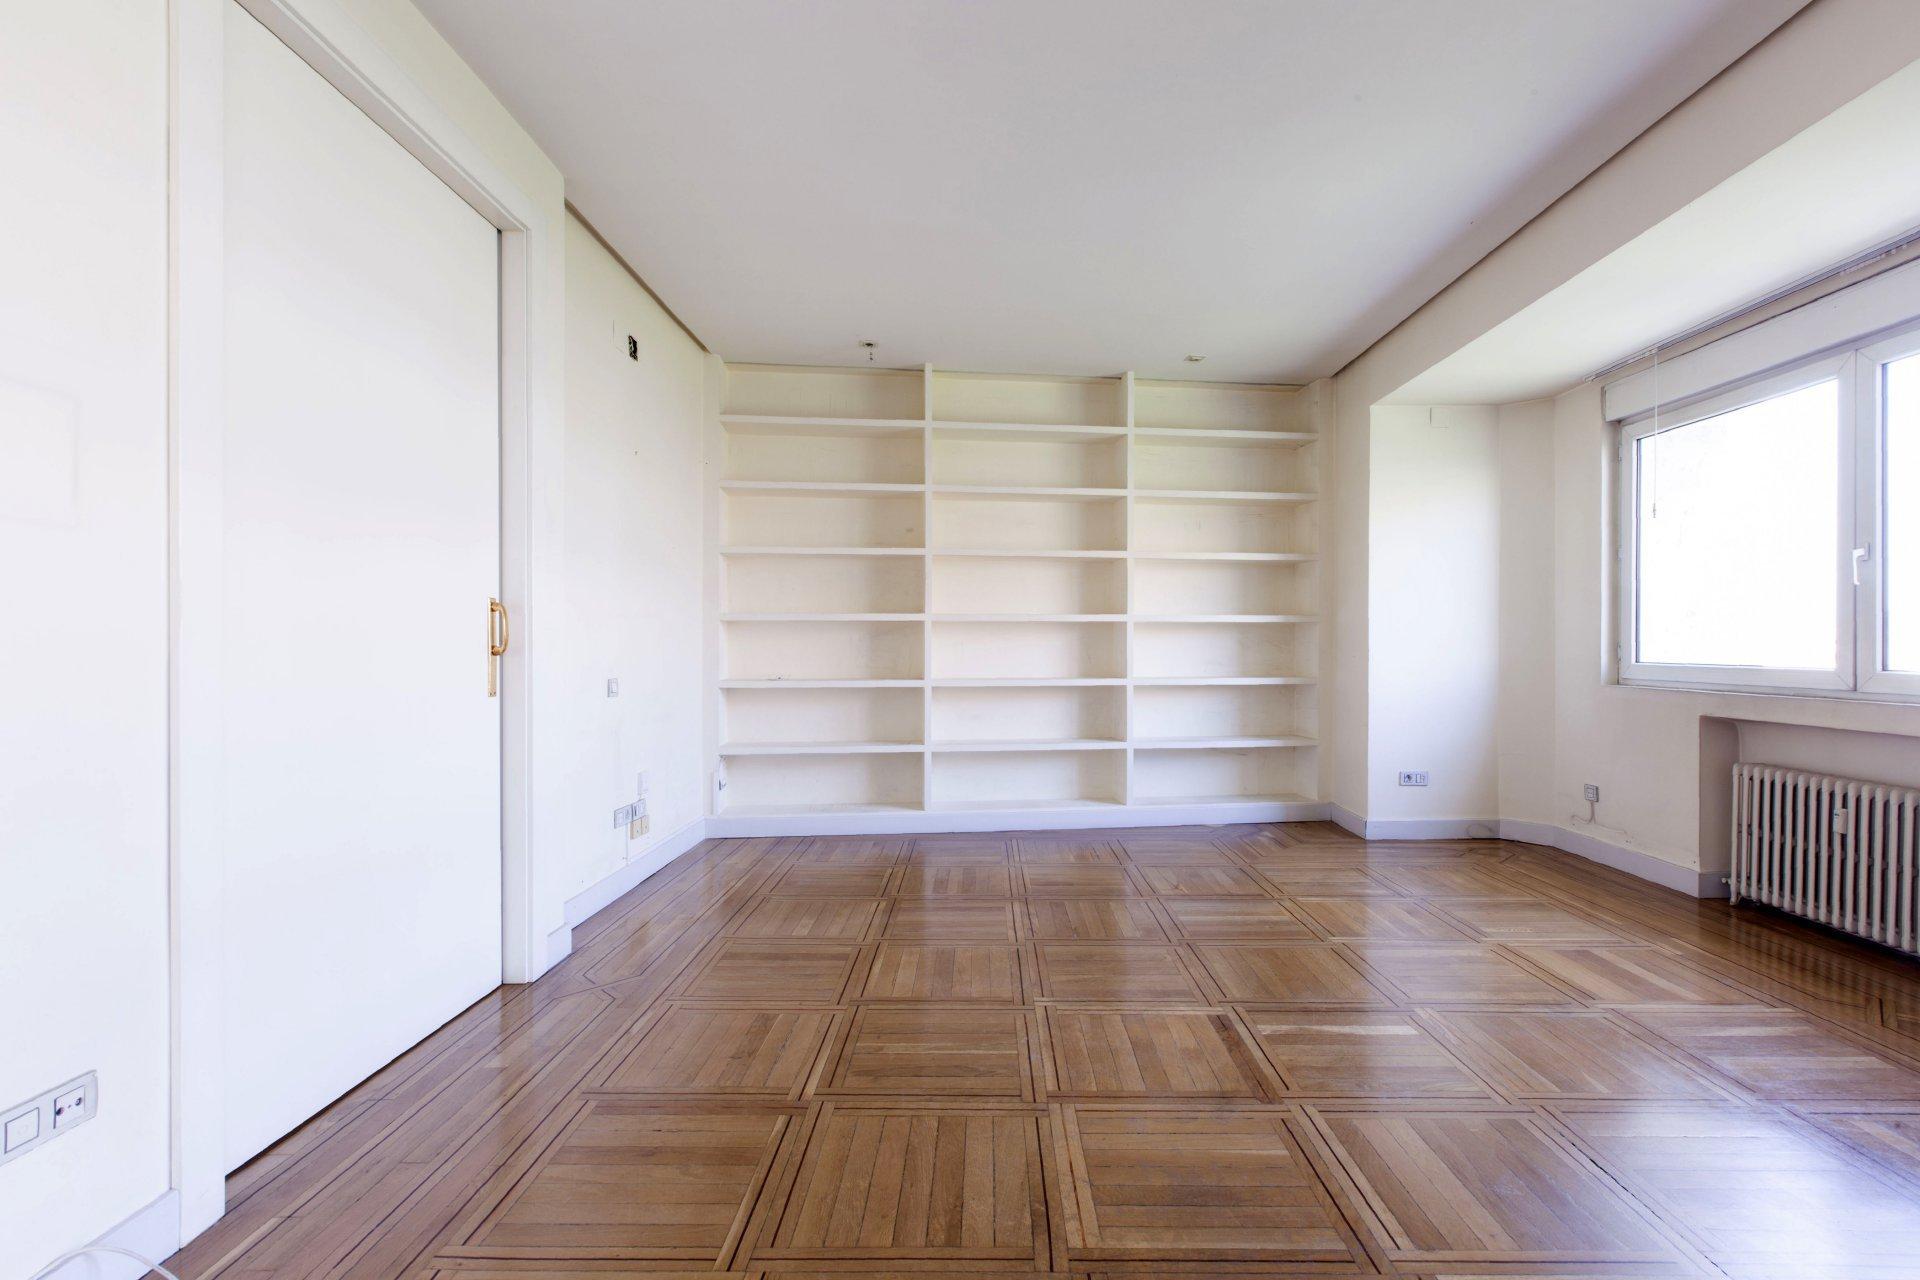 Anuncio alquiler piso madrid recoletos 28000 john taylor for Alquiler pisos madrid moncloa